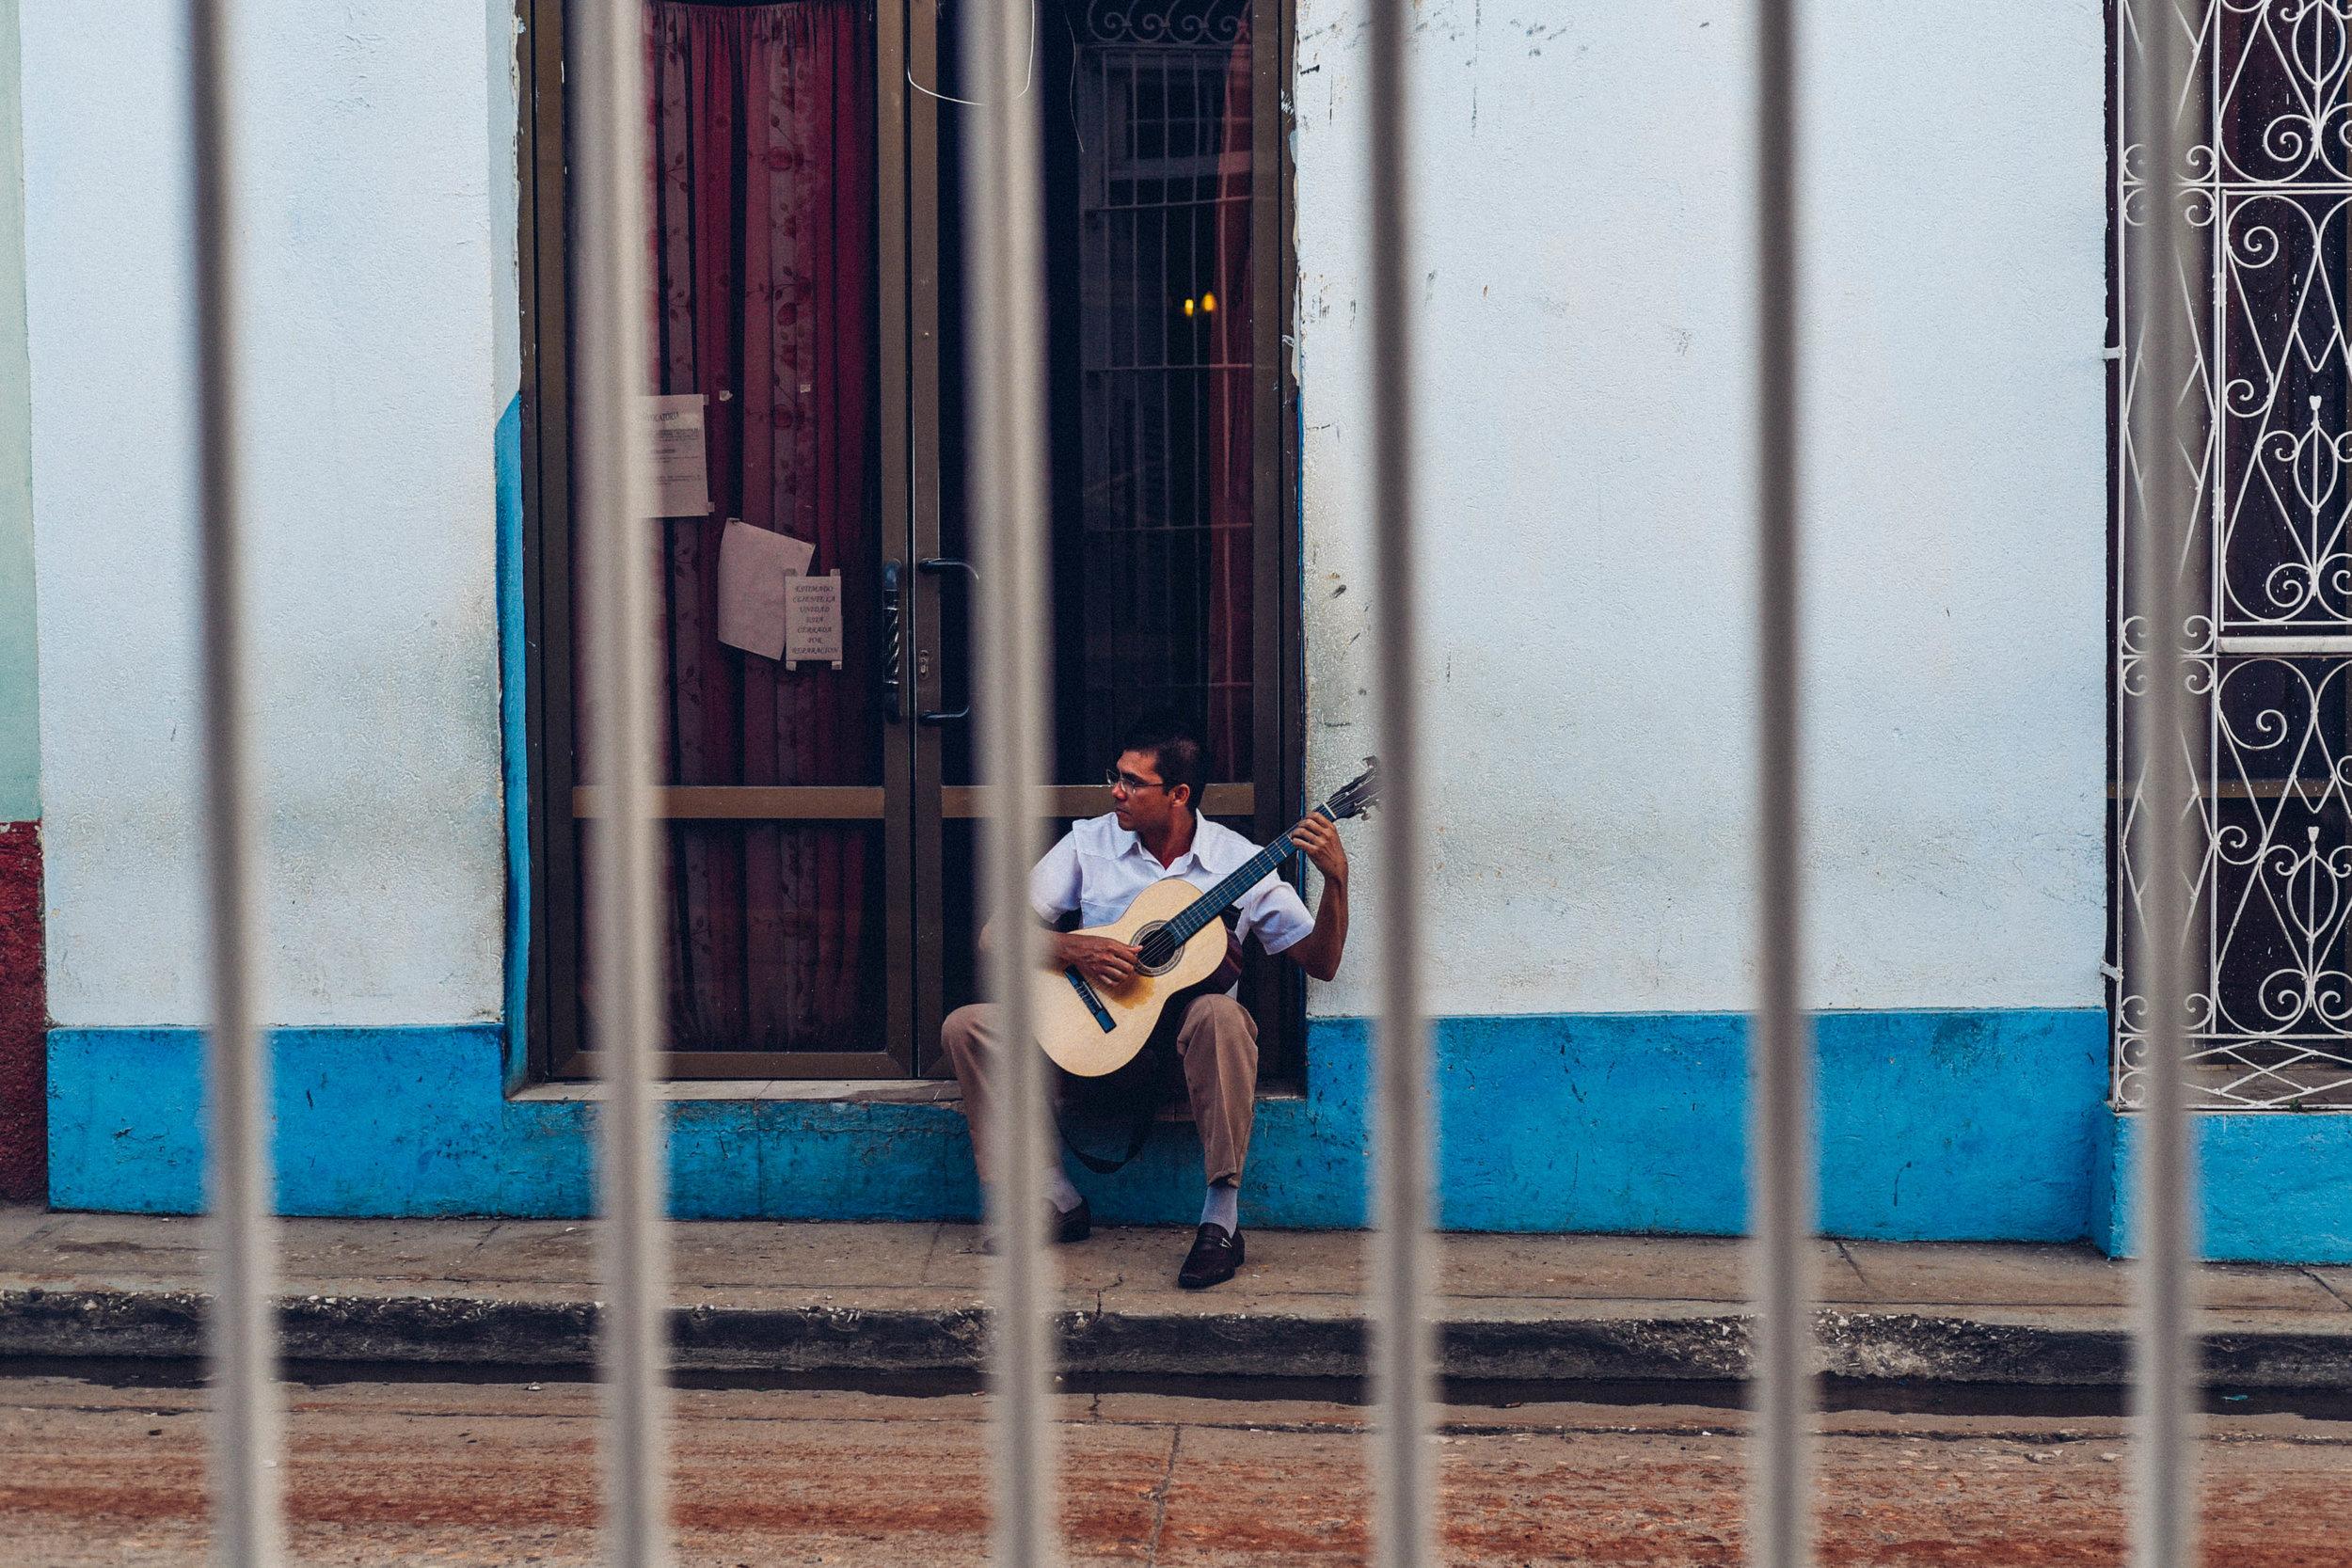 Cuba_Trinidad-13.jpg